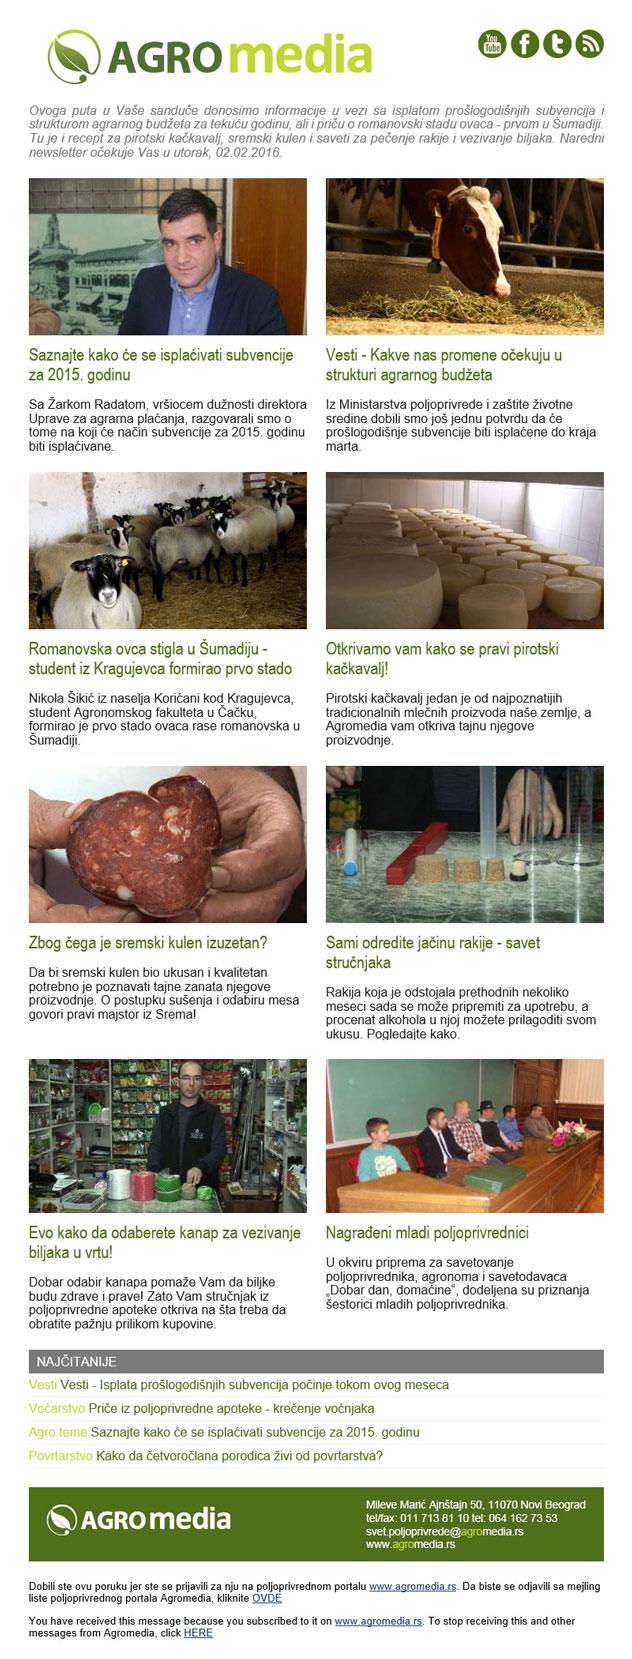 Newsletter poljoprivrednog portala Agromedia